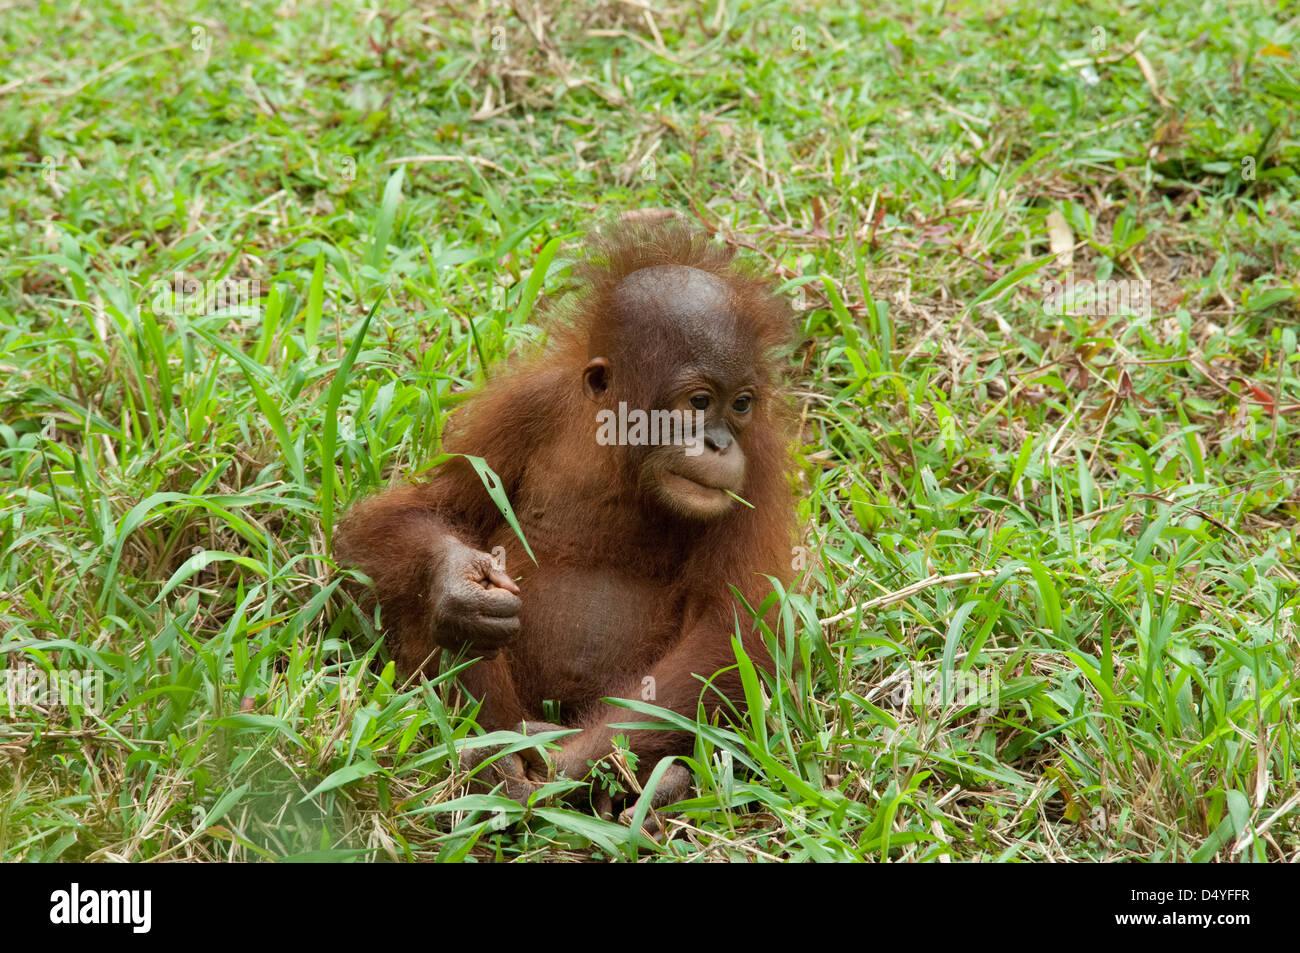 Malaysia, Island of Borneo, Sabah, Kota Kinabalu, Lok Kawi Wildlife Park. Baby Bornean Orangutan. - Stock Image